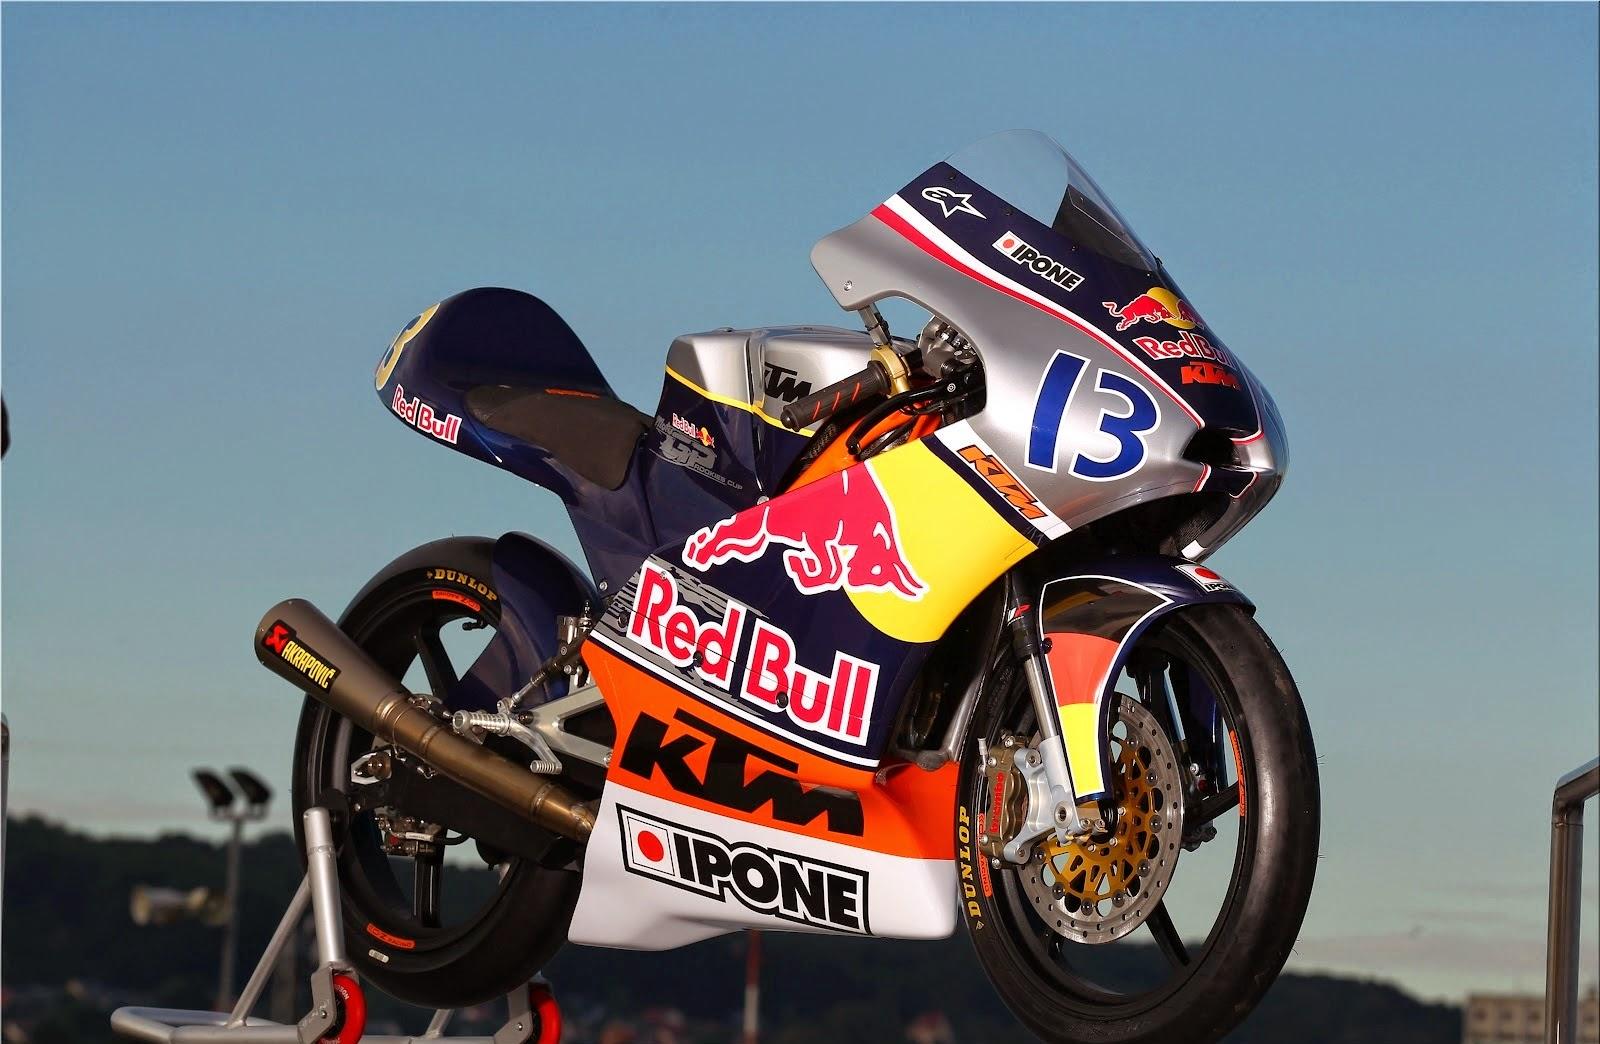 KTM Motogp Rookies Cup New Bikes Hd Wallpapers